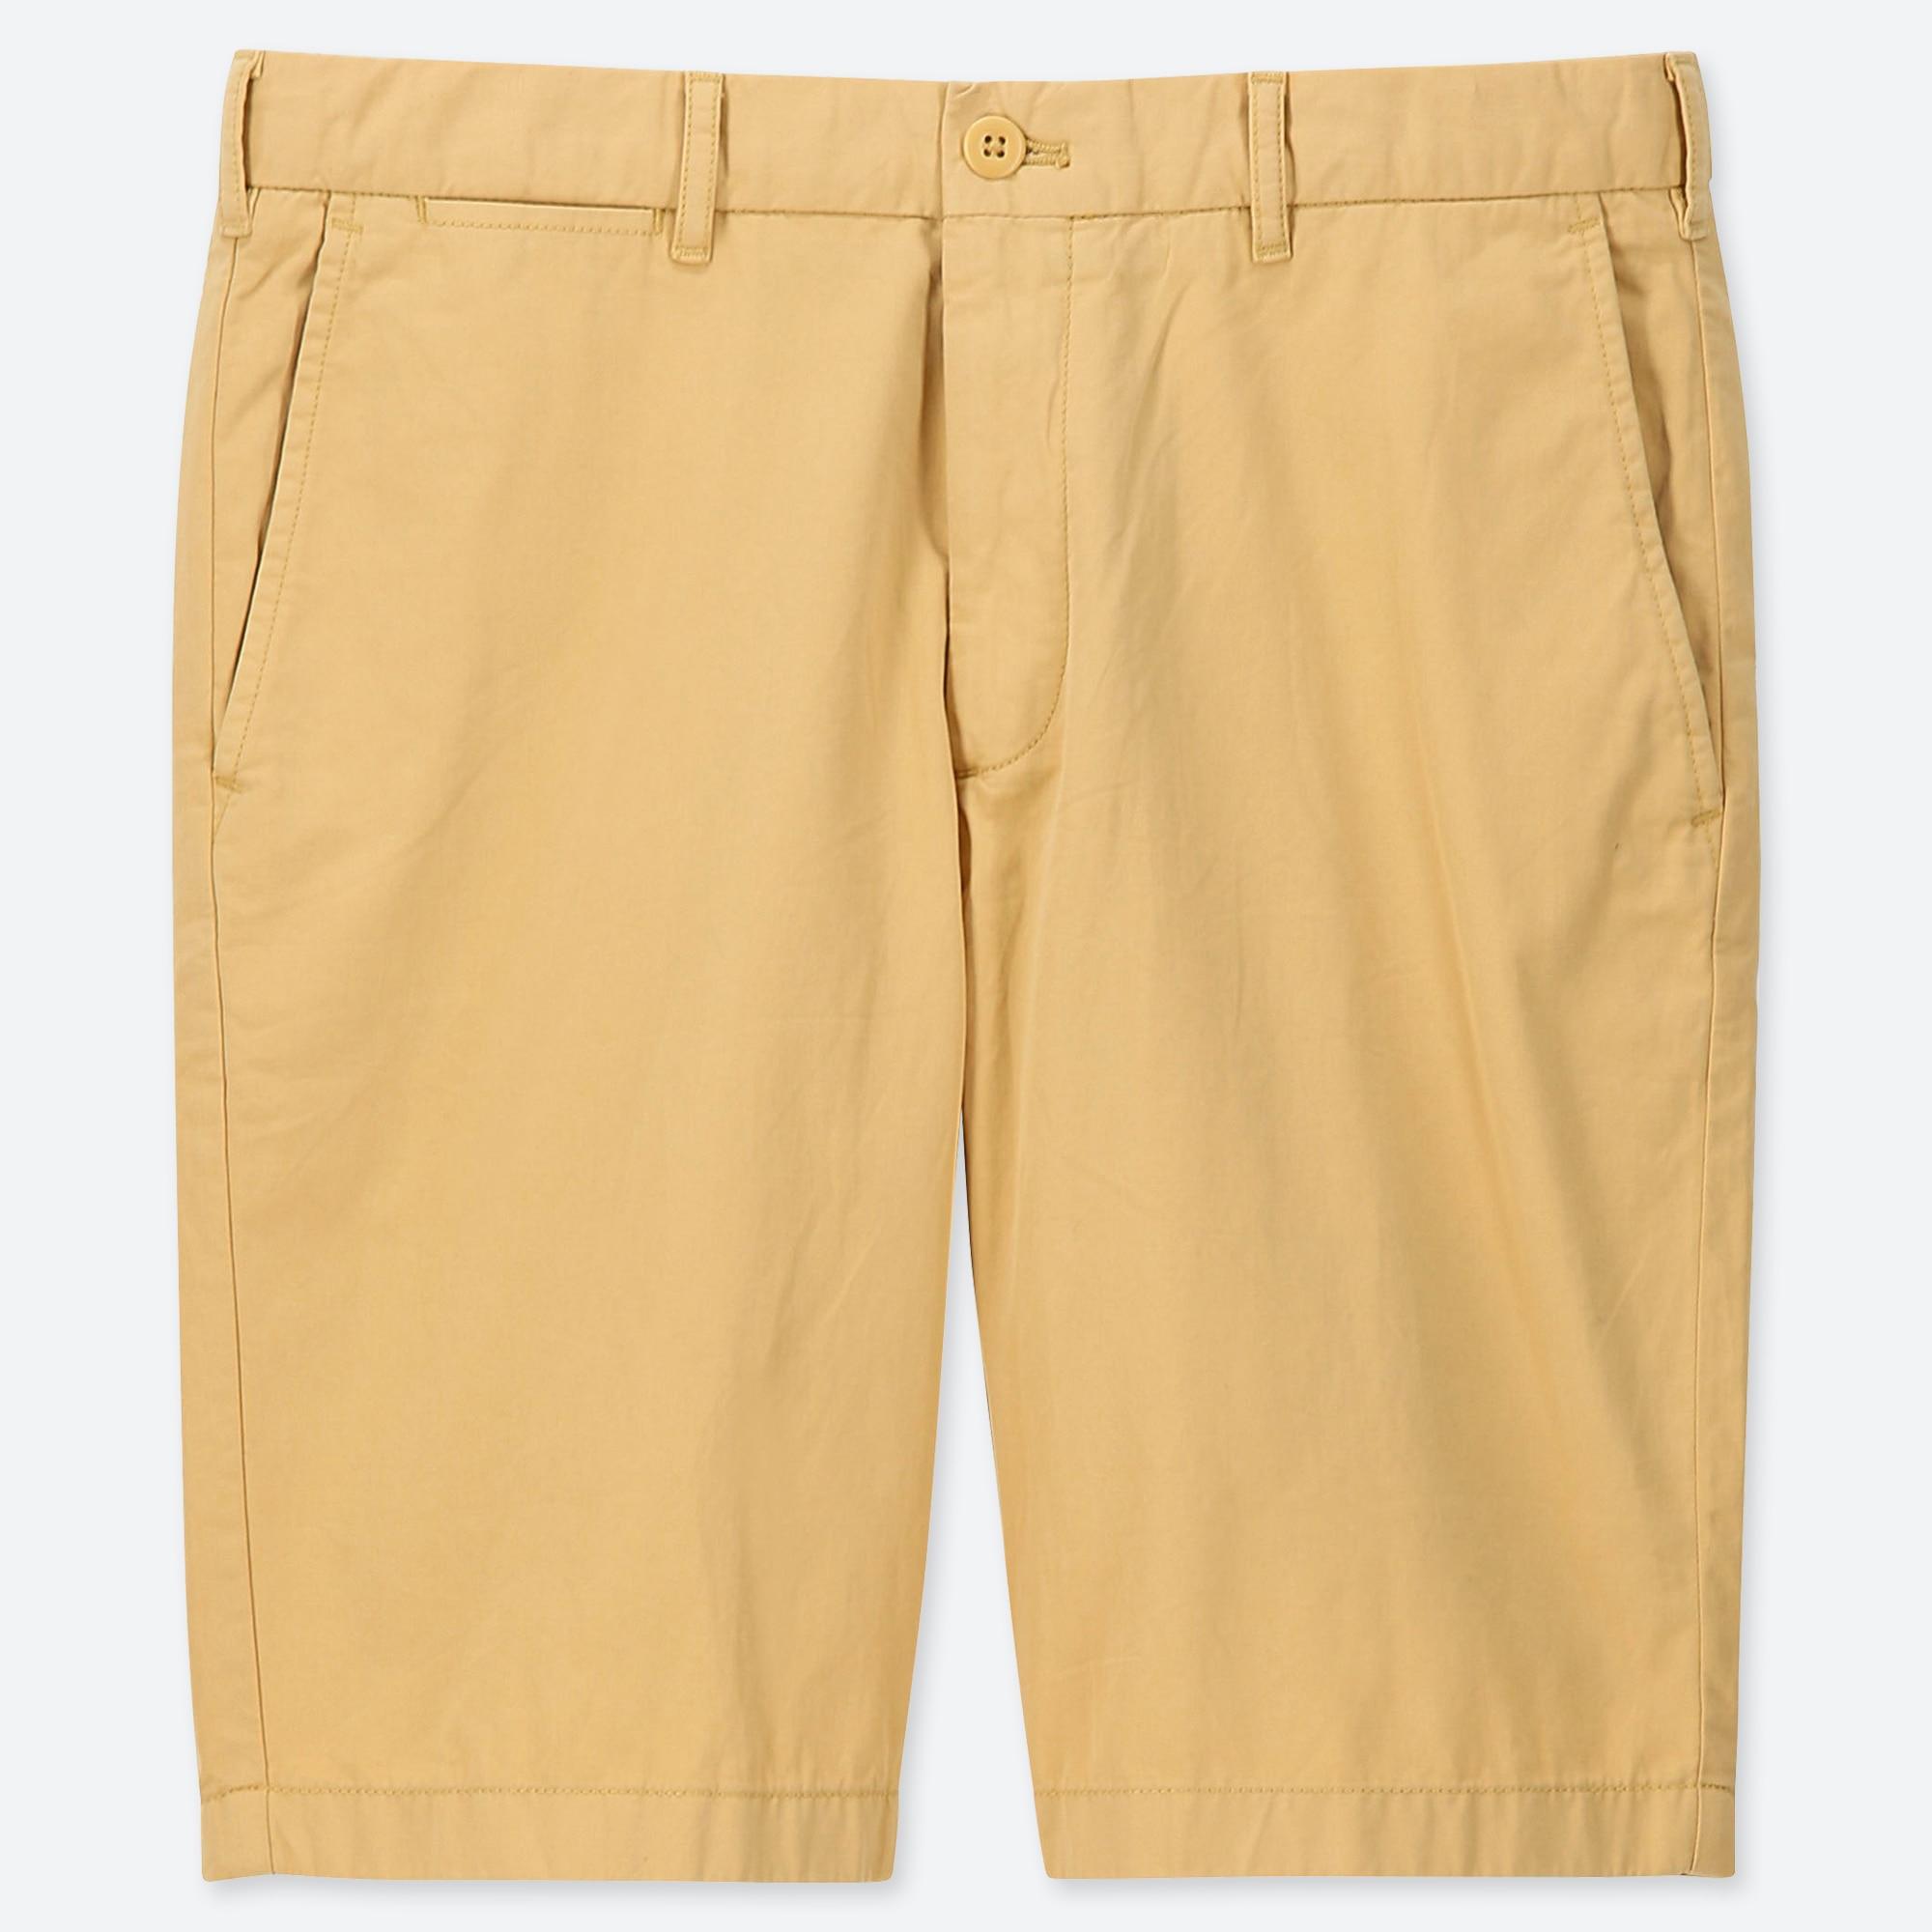 Chino HommeUniqlo HommeUniqlo Shorts Chino Shorts Chino Shorts HommeUniqlo Chino HommeUniqlo Shorts 1clF3JTK